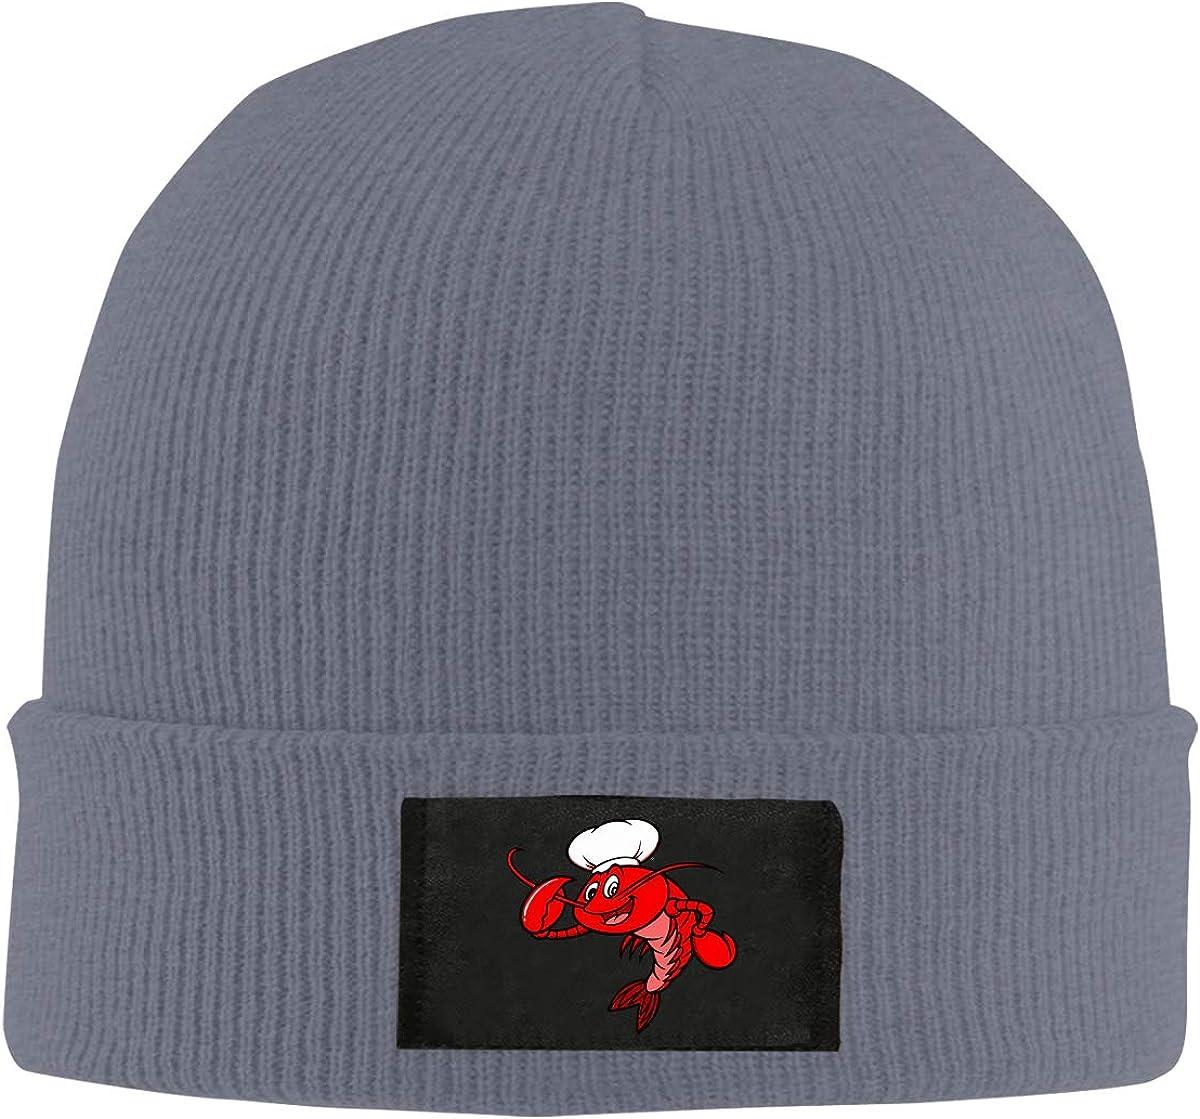 Crawfish Chef Unisex Knitted Hat Winter Warm Snowboarding Hat